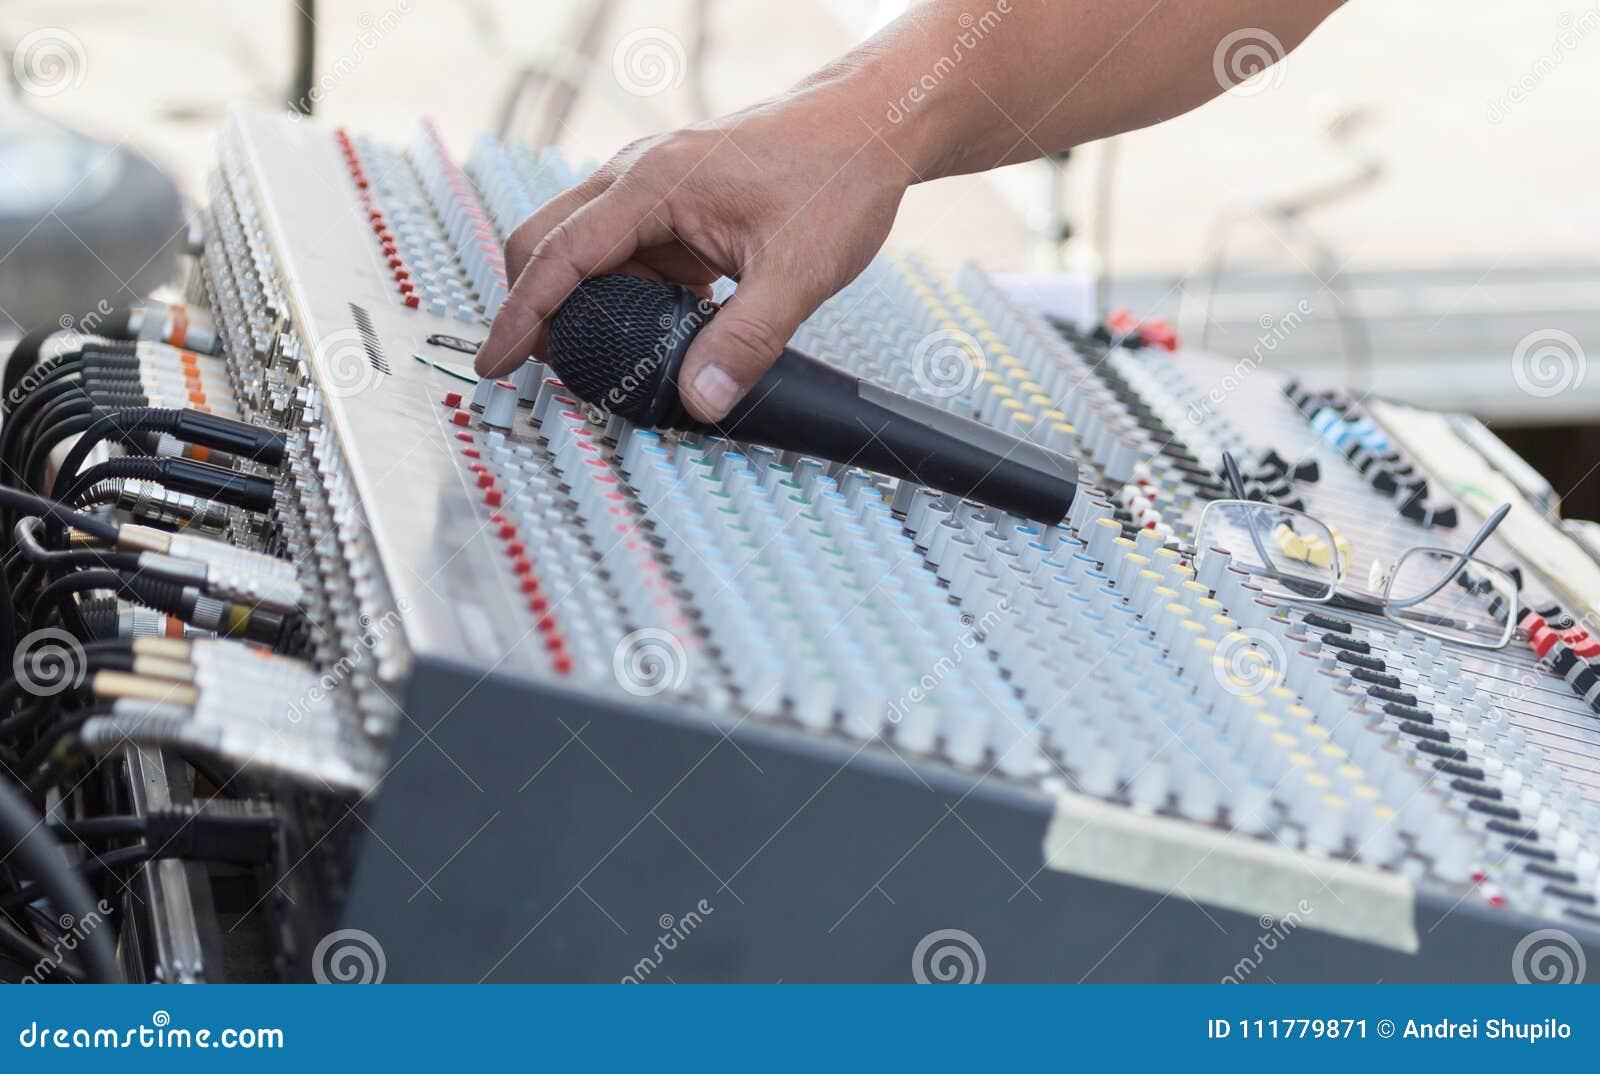 Concert music control